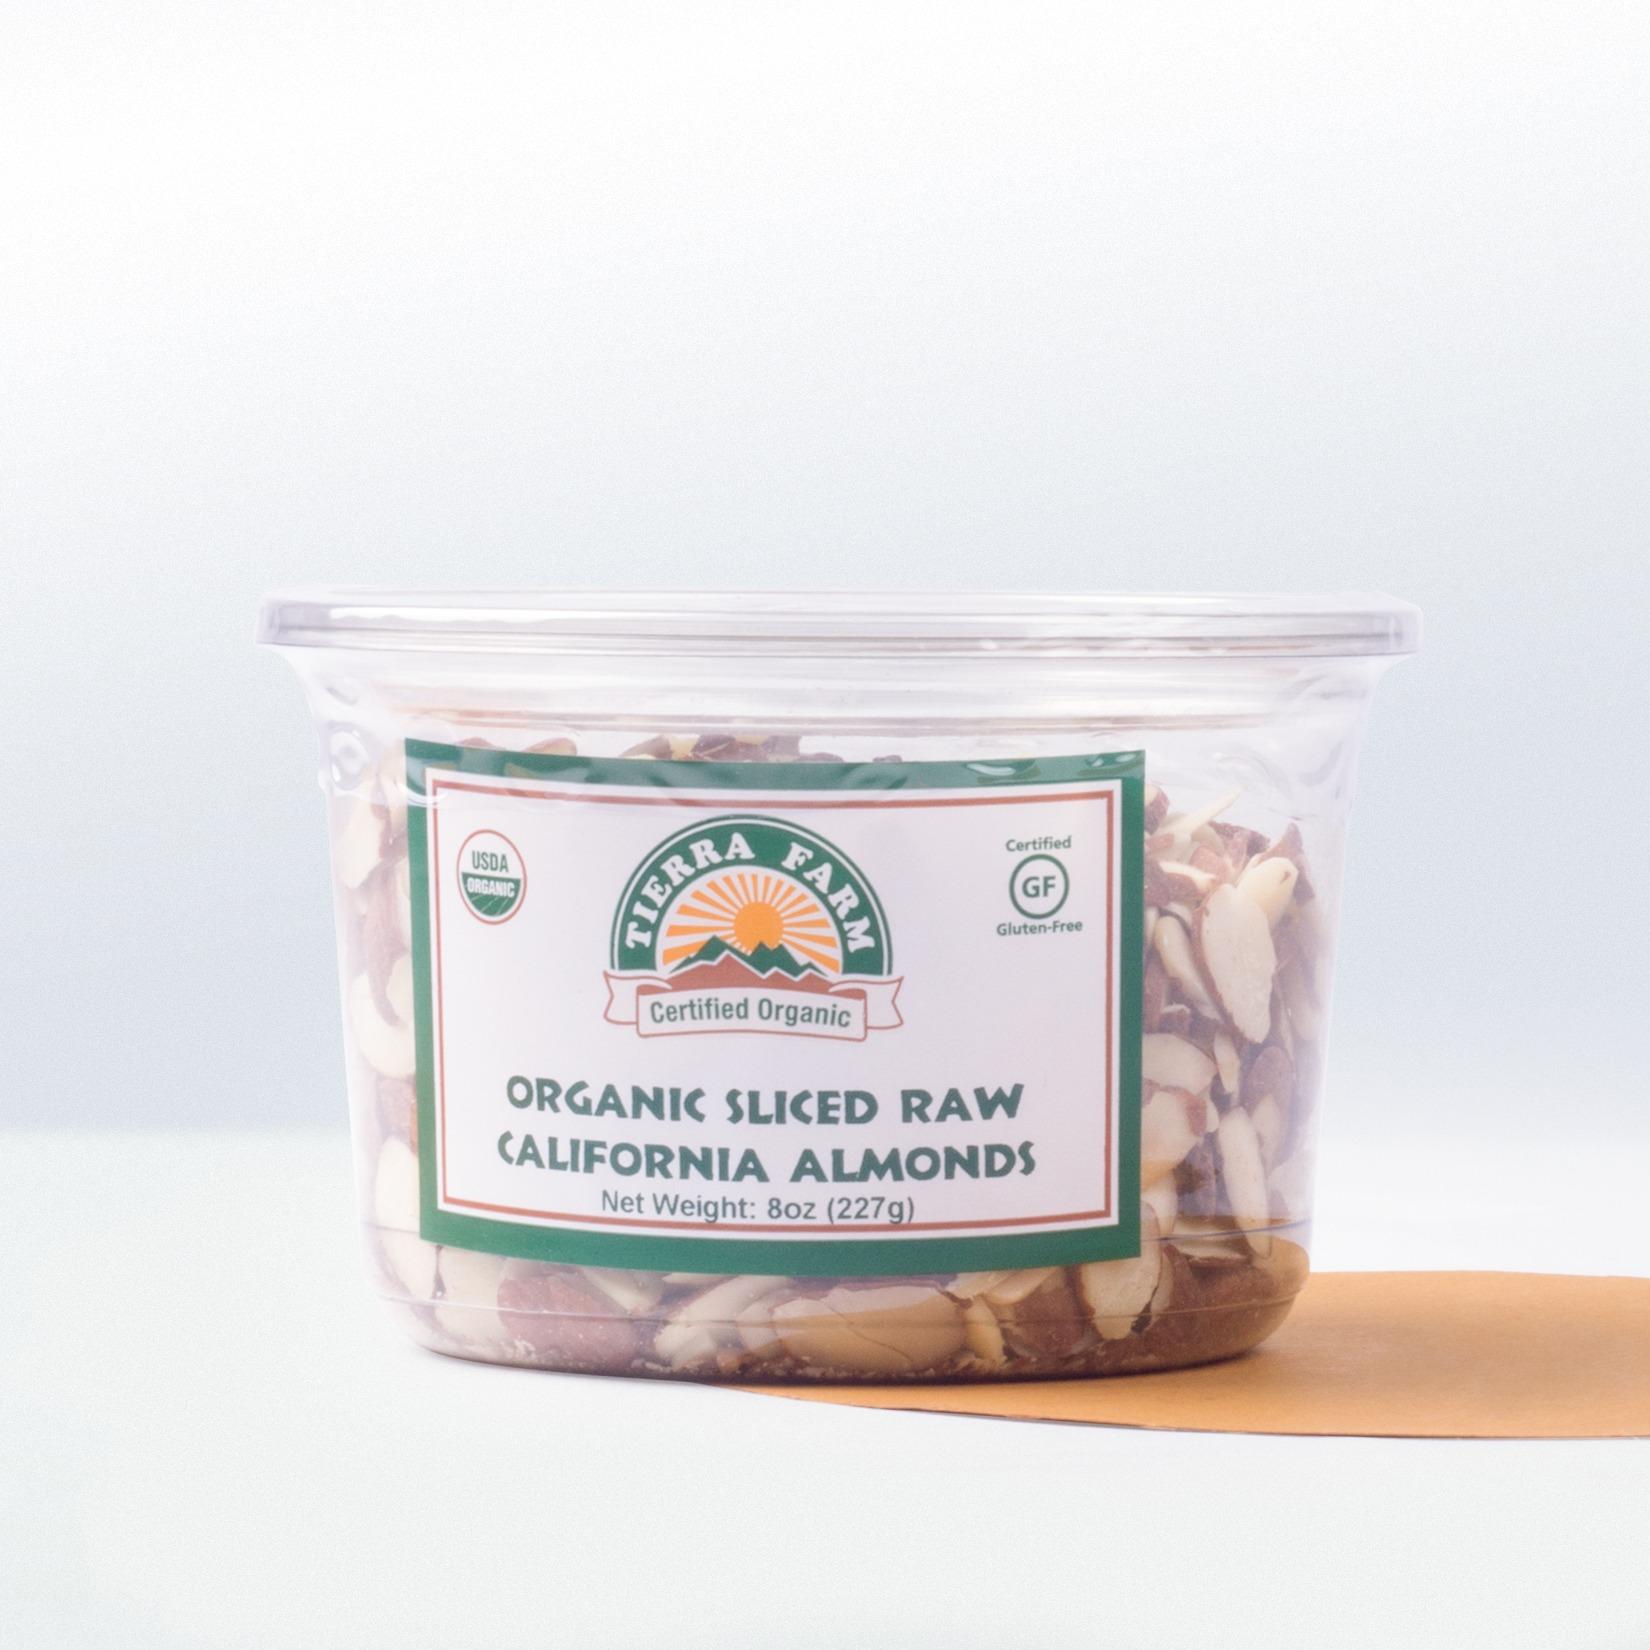 Tierra Farm-Organic Sliced RawCalifornia Almonds